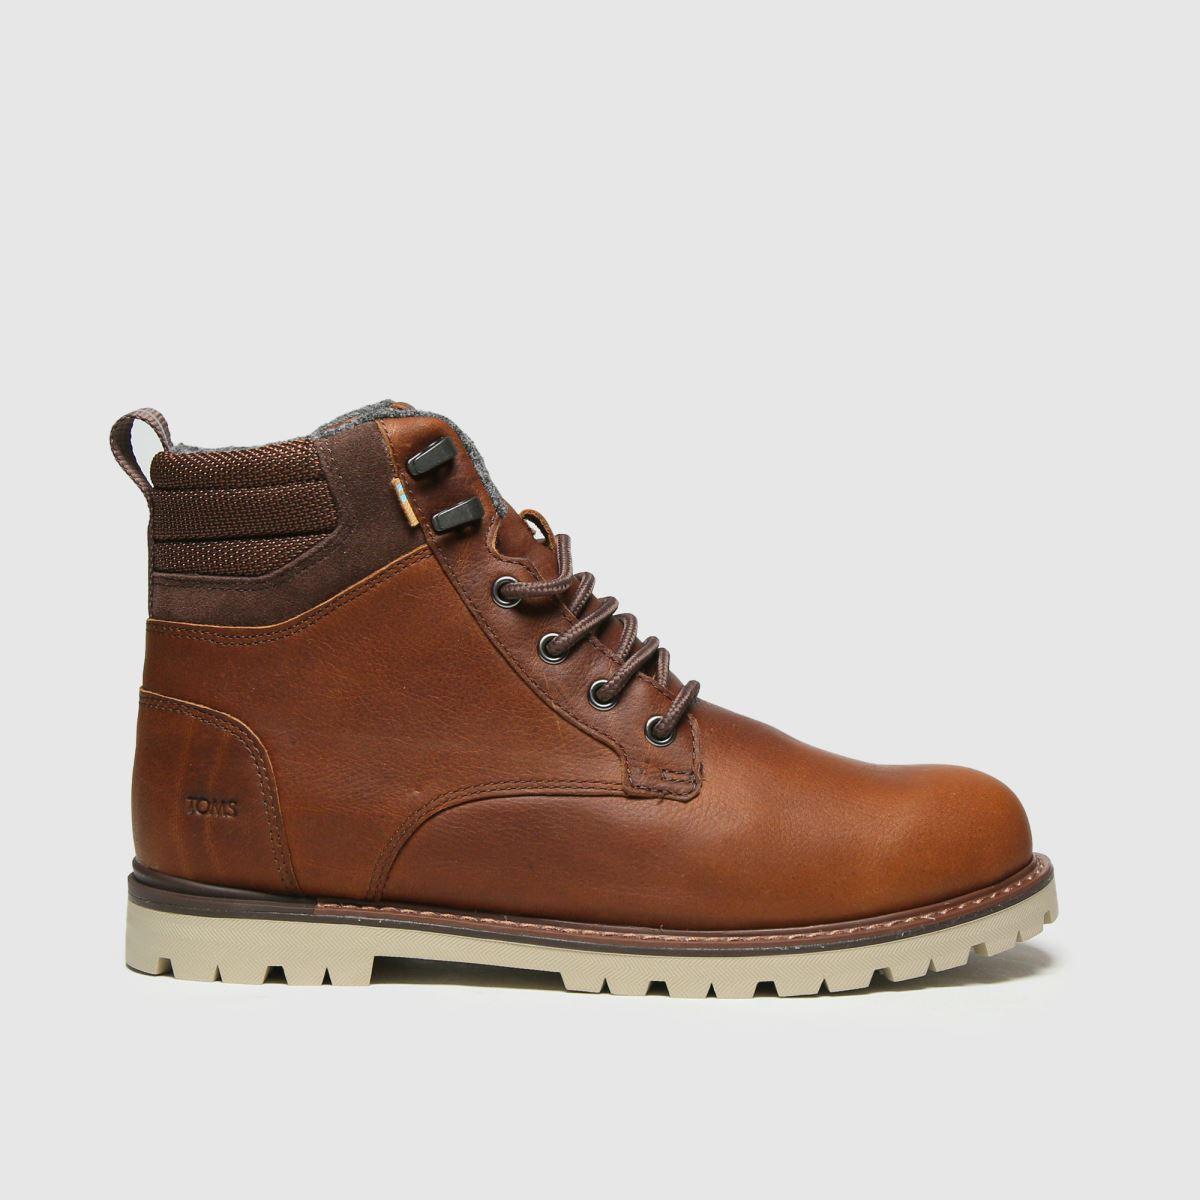 TOMS Tan Ashland 2.0 Boots